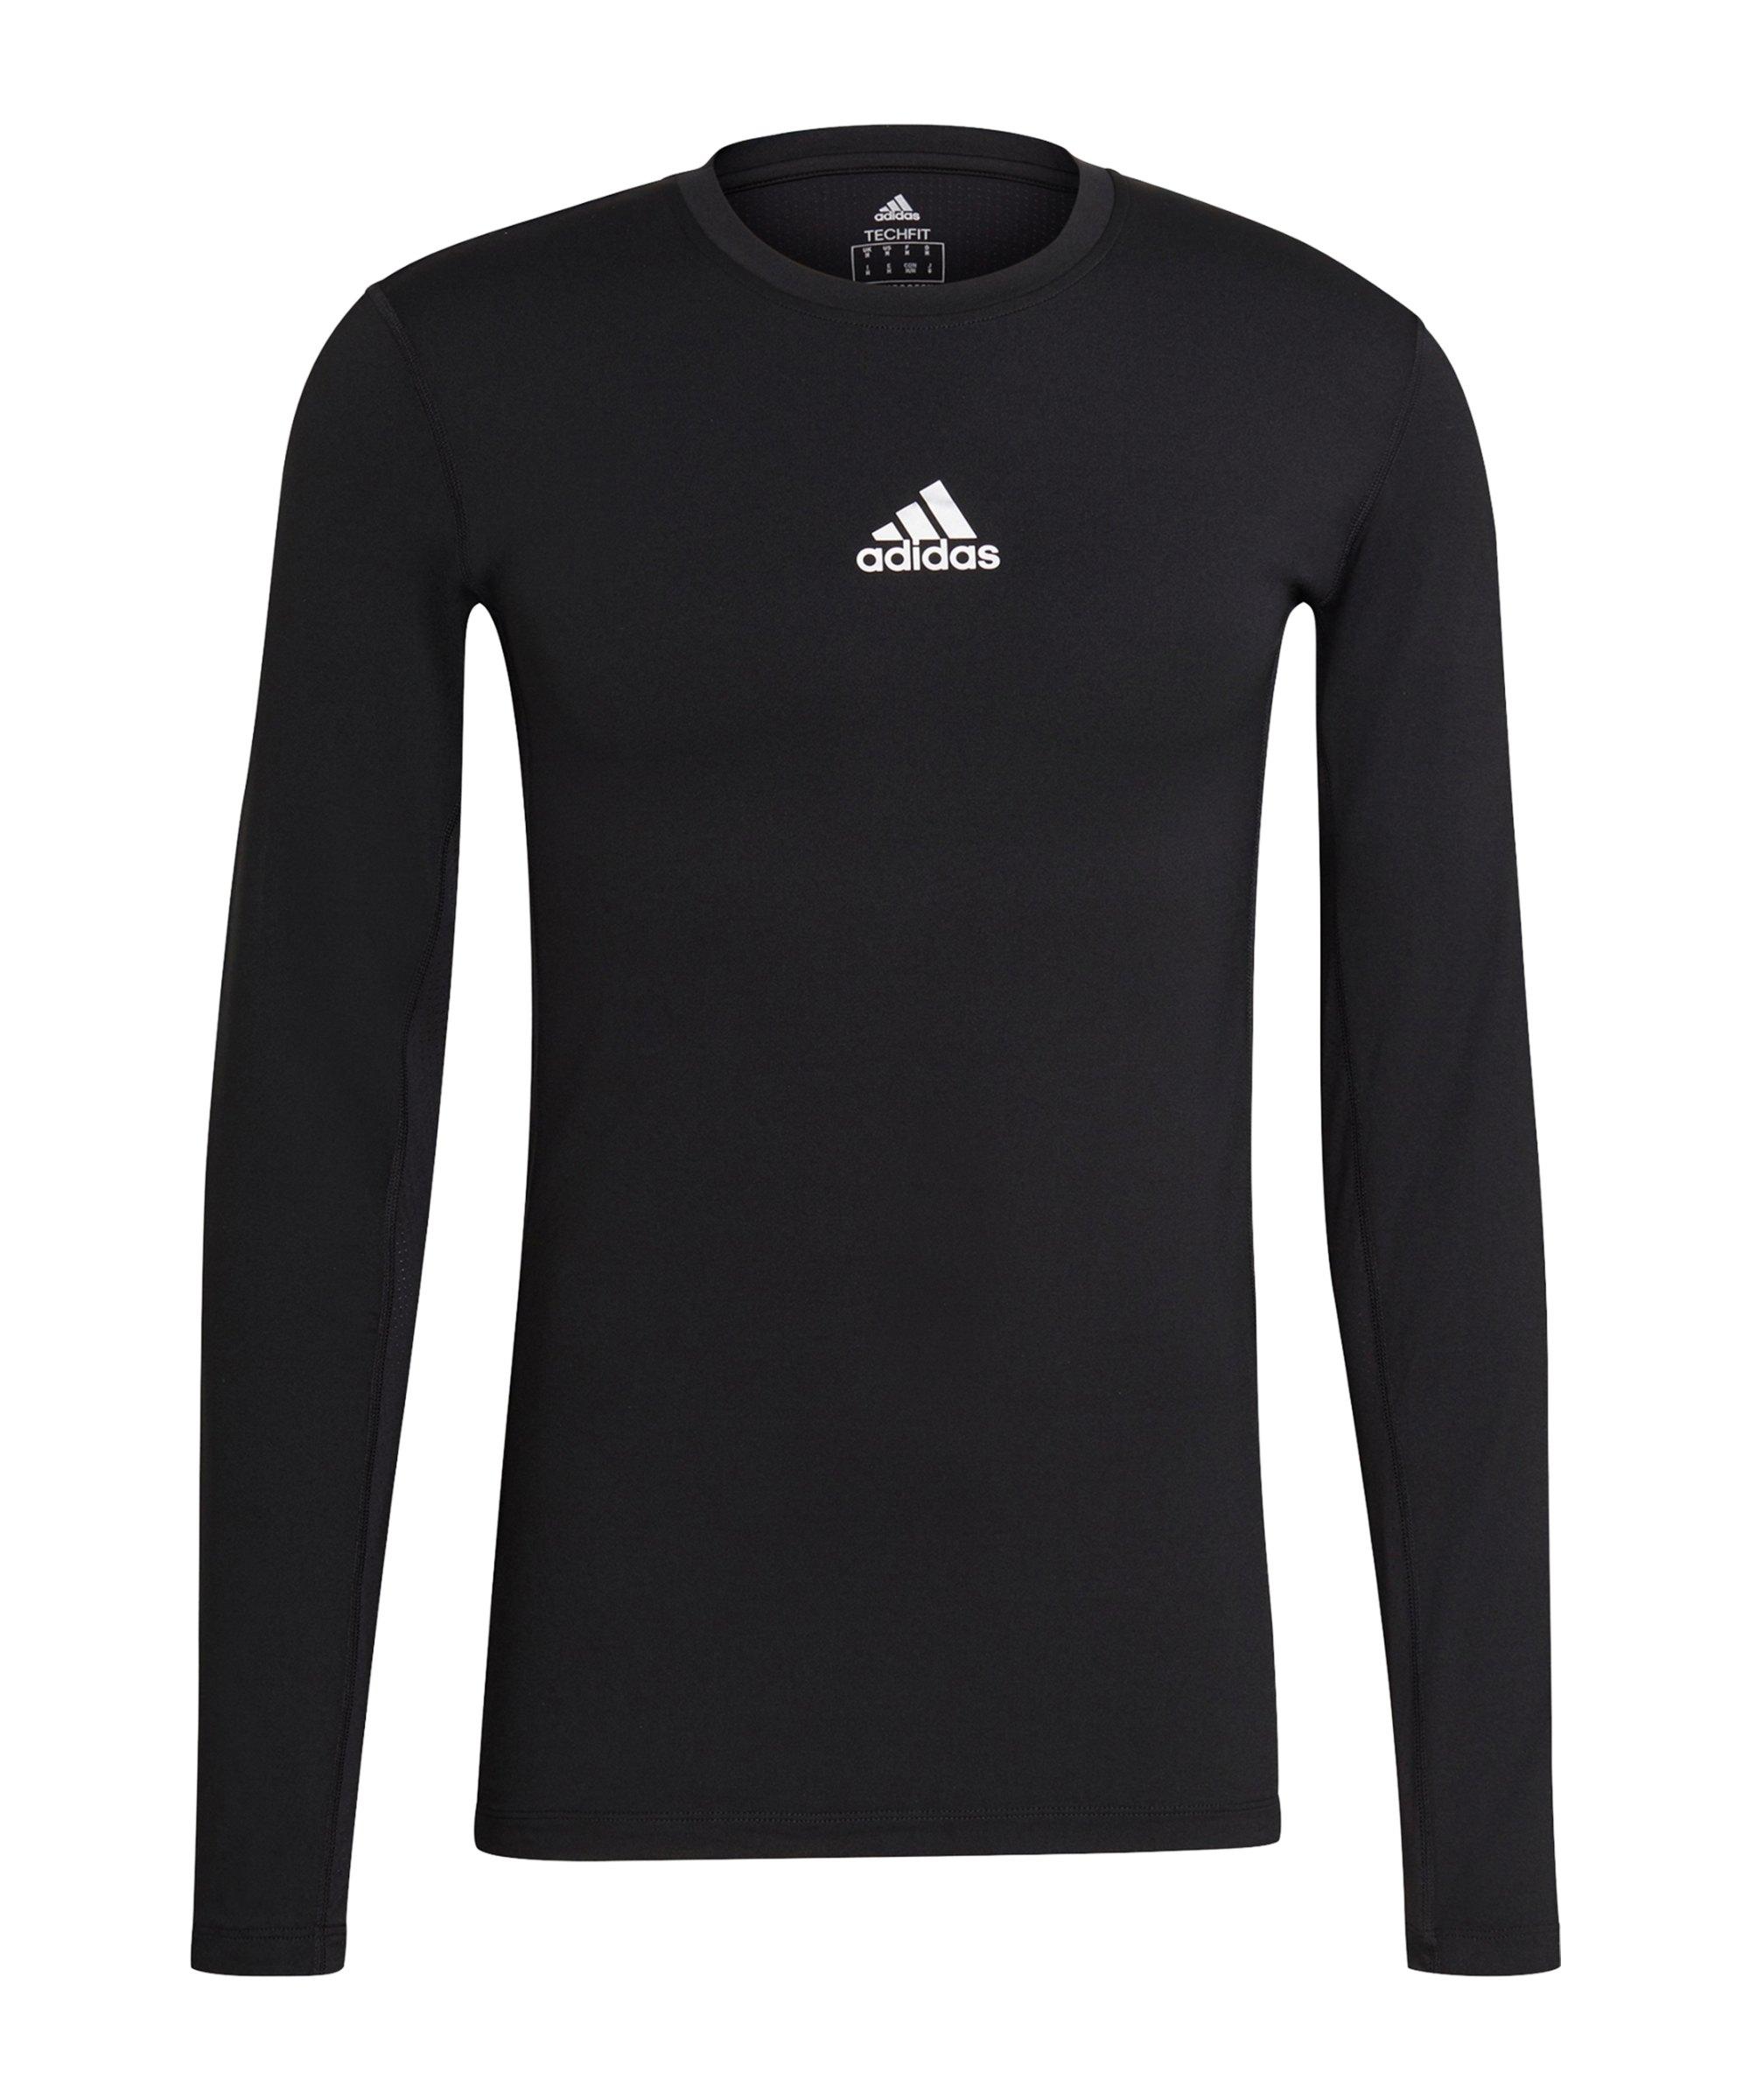 adidas Techfit Shirt langarm Schwarz - schwarz